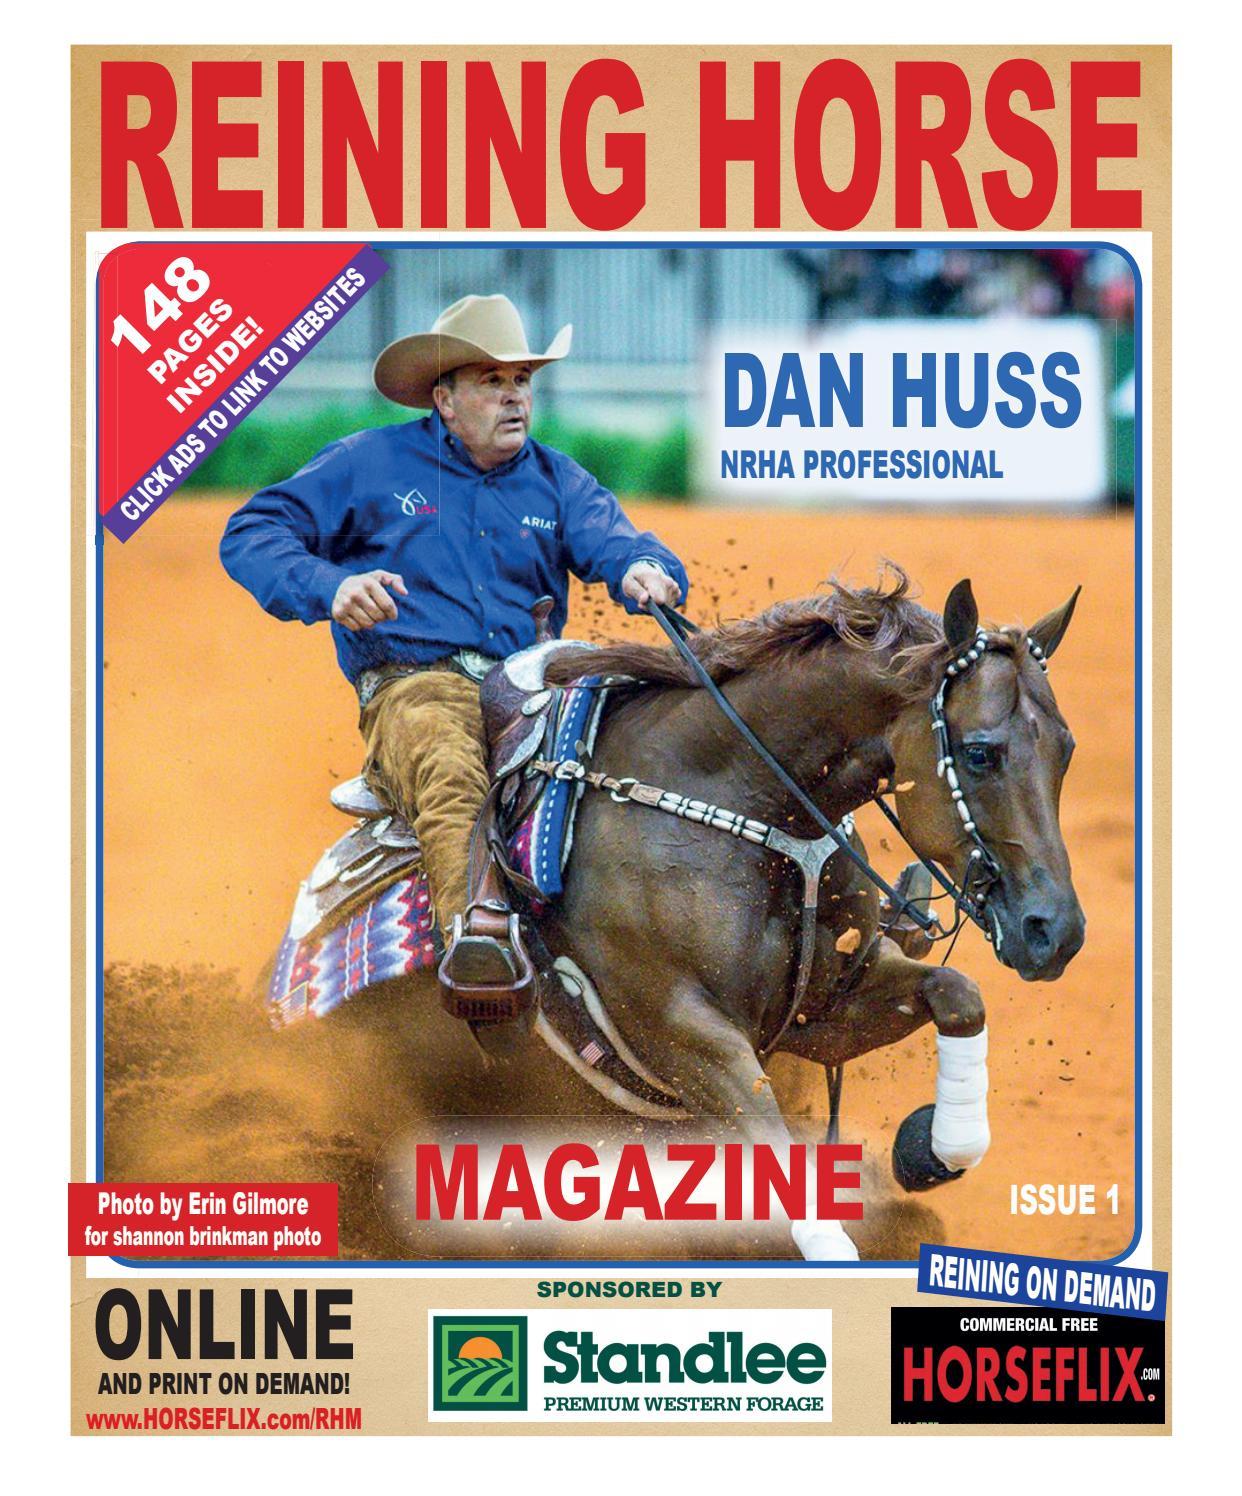 Reining Horse Magazine March 2019 by Bridle & Bit - issuu